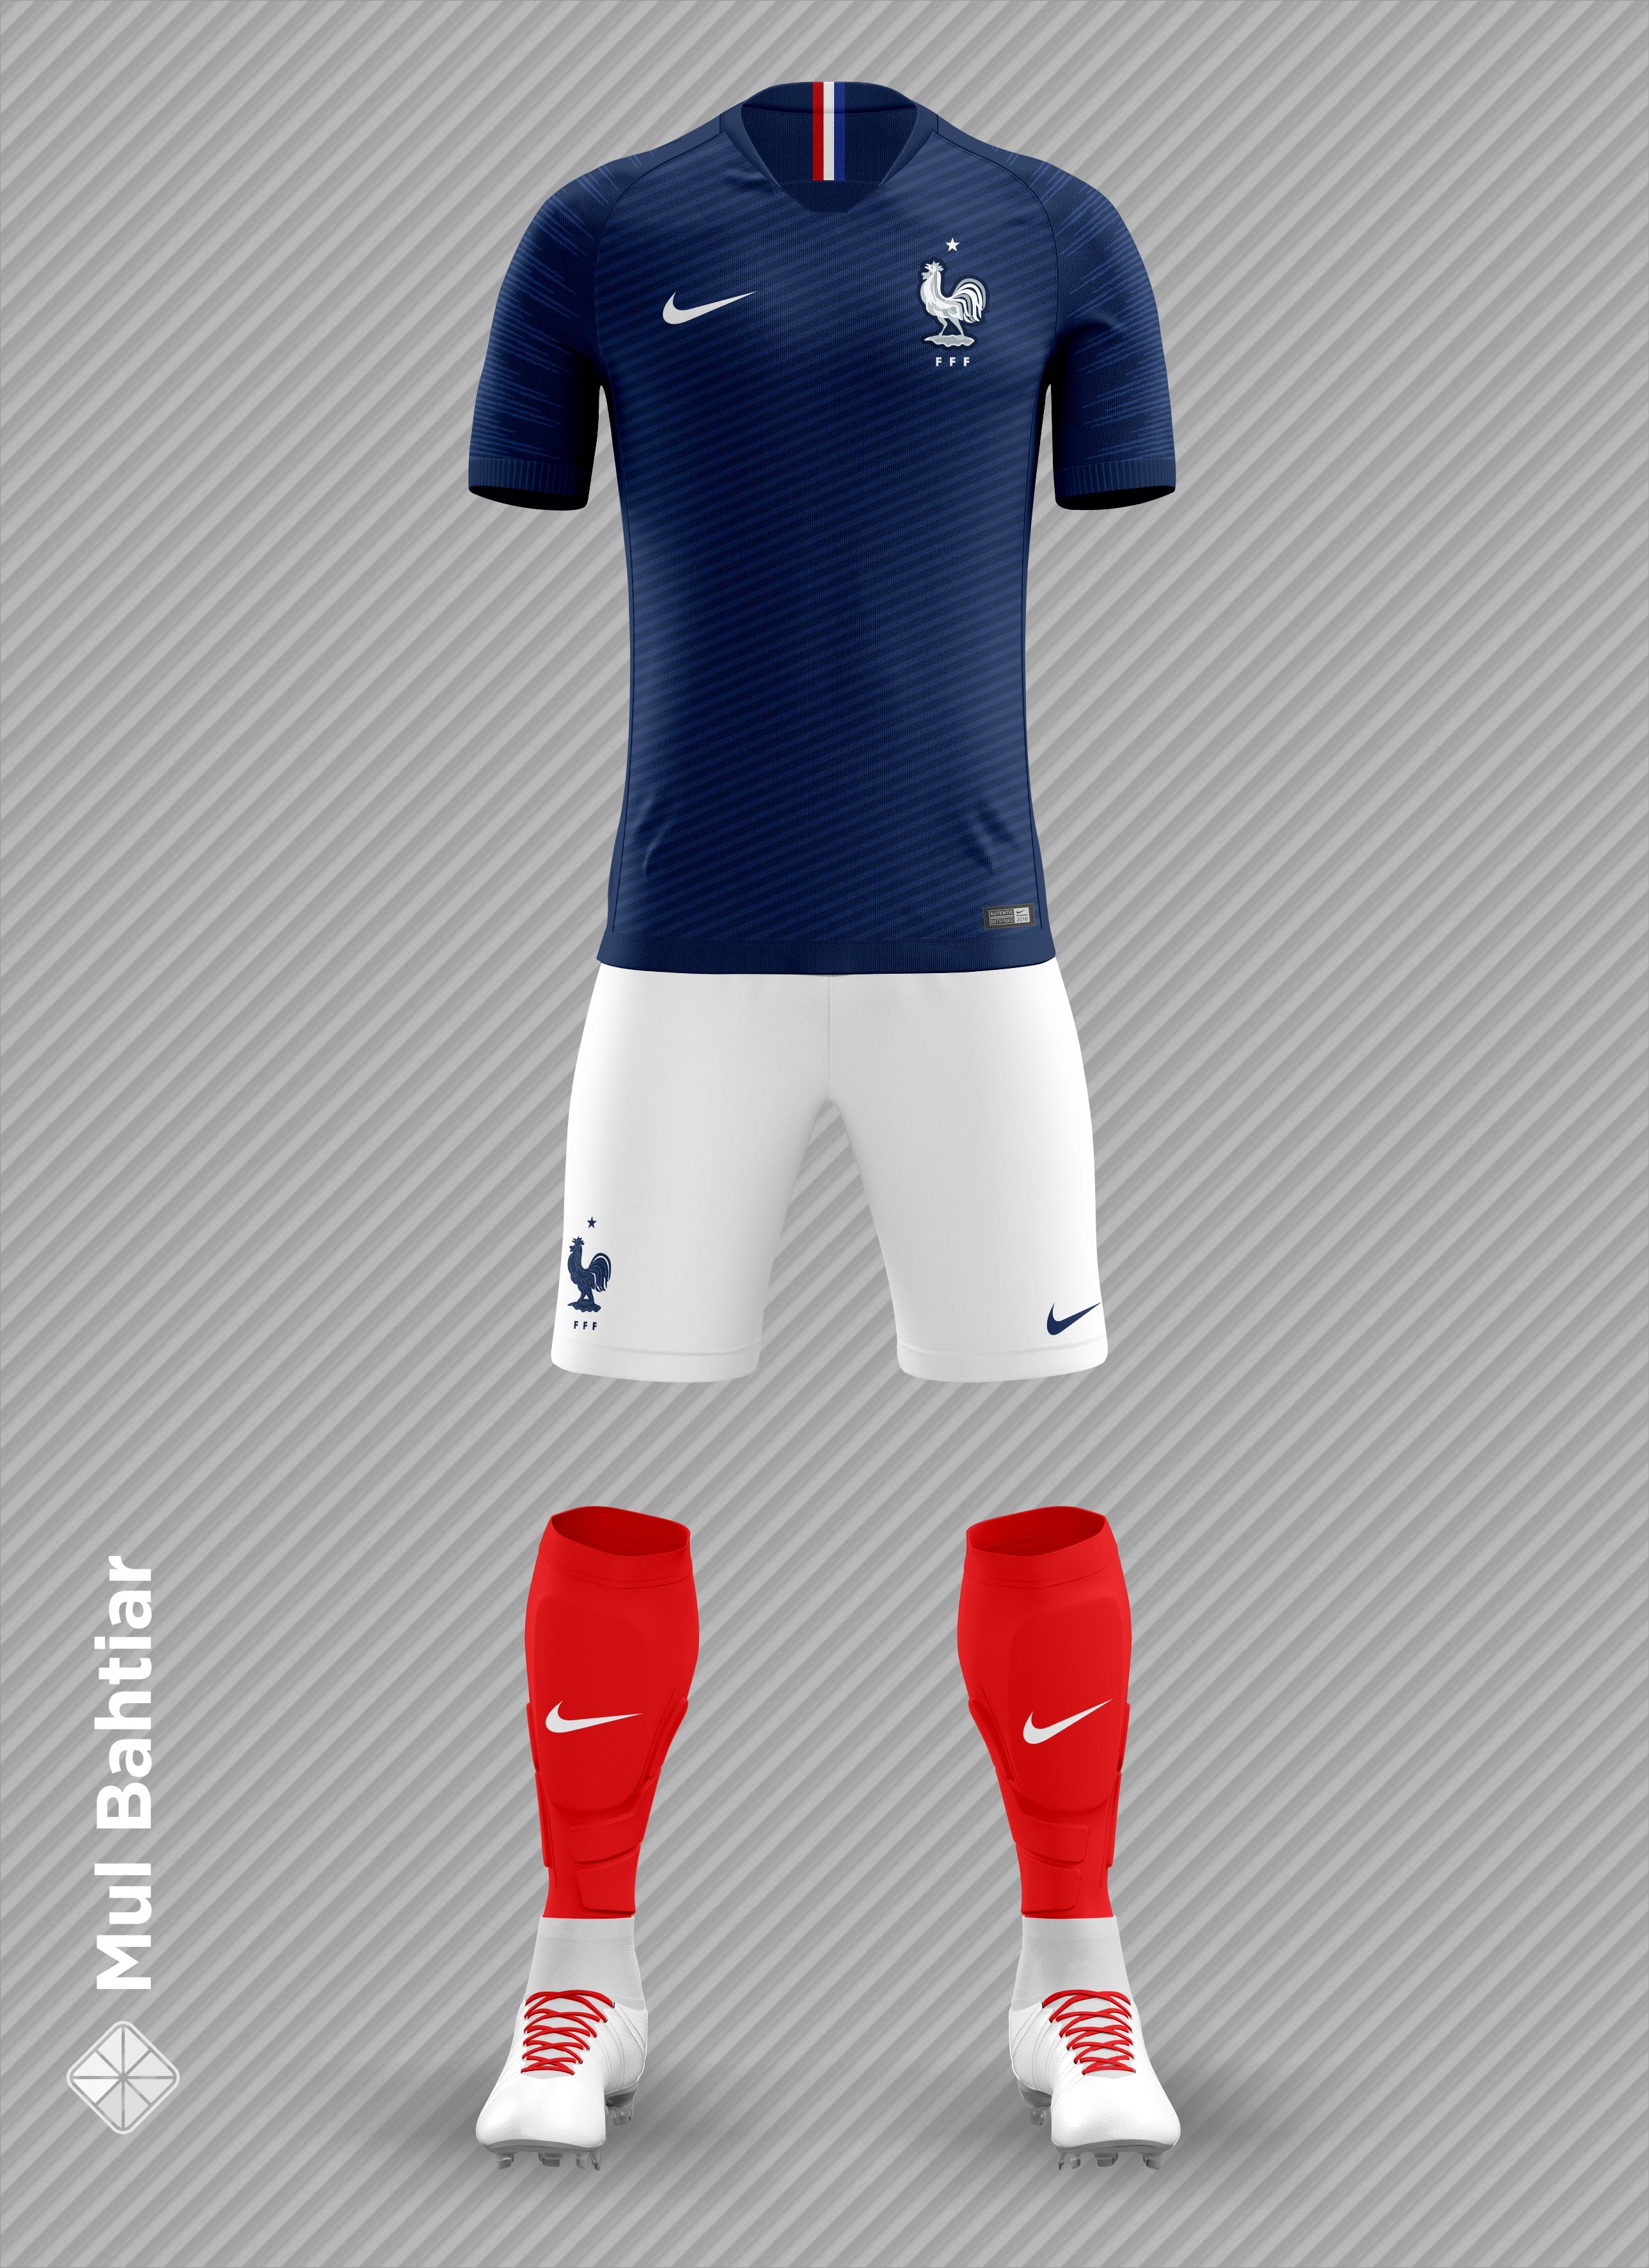 0f4c0b0e3c36a France 2018 FIFA World Cup Home Kit